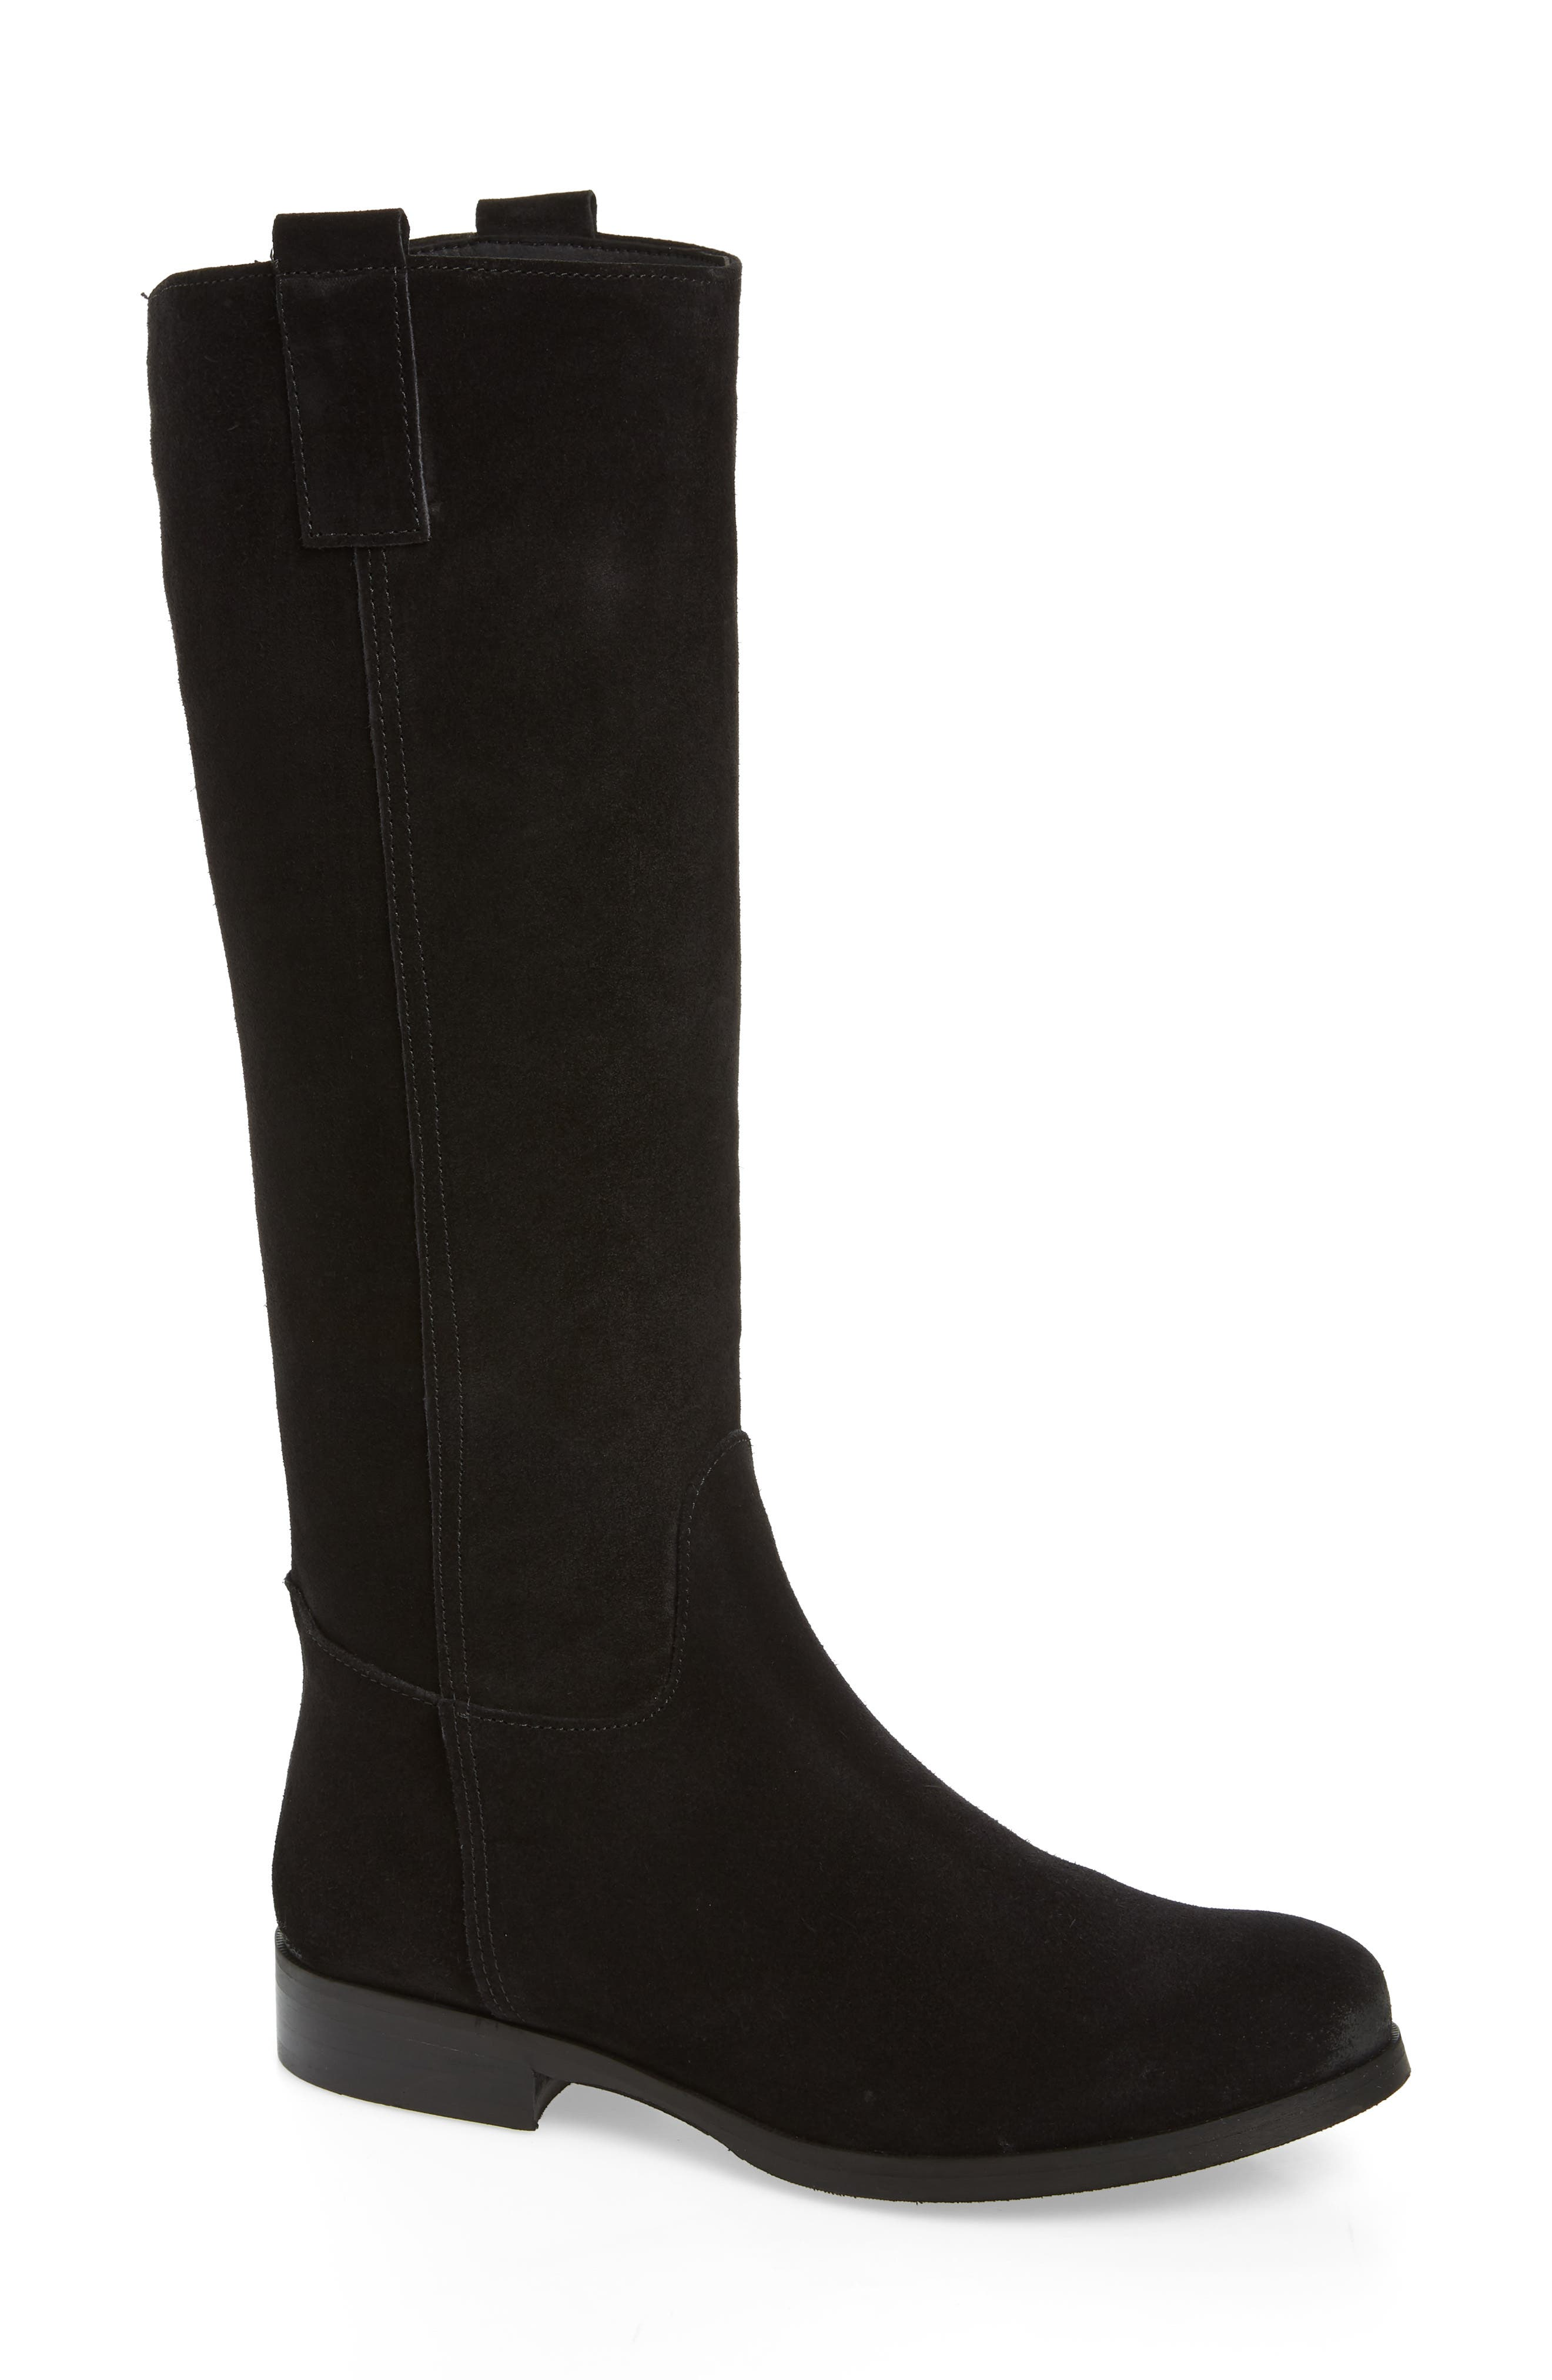 Cordani Benji Knee High Boot